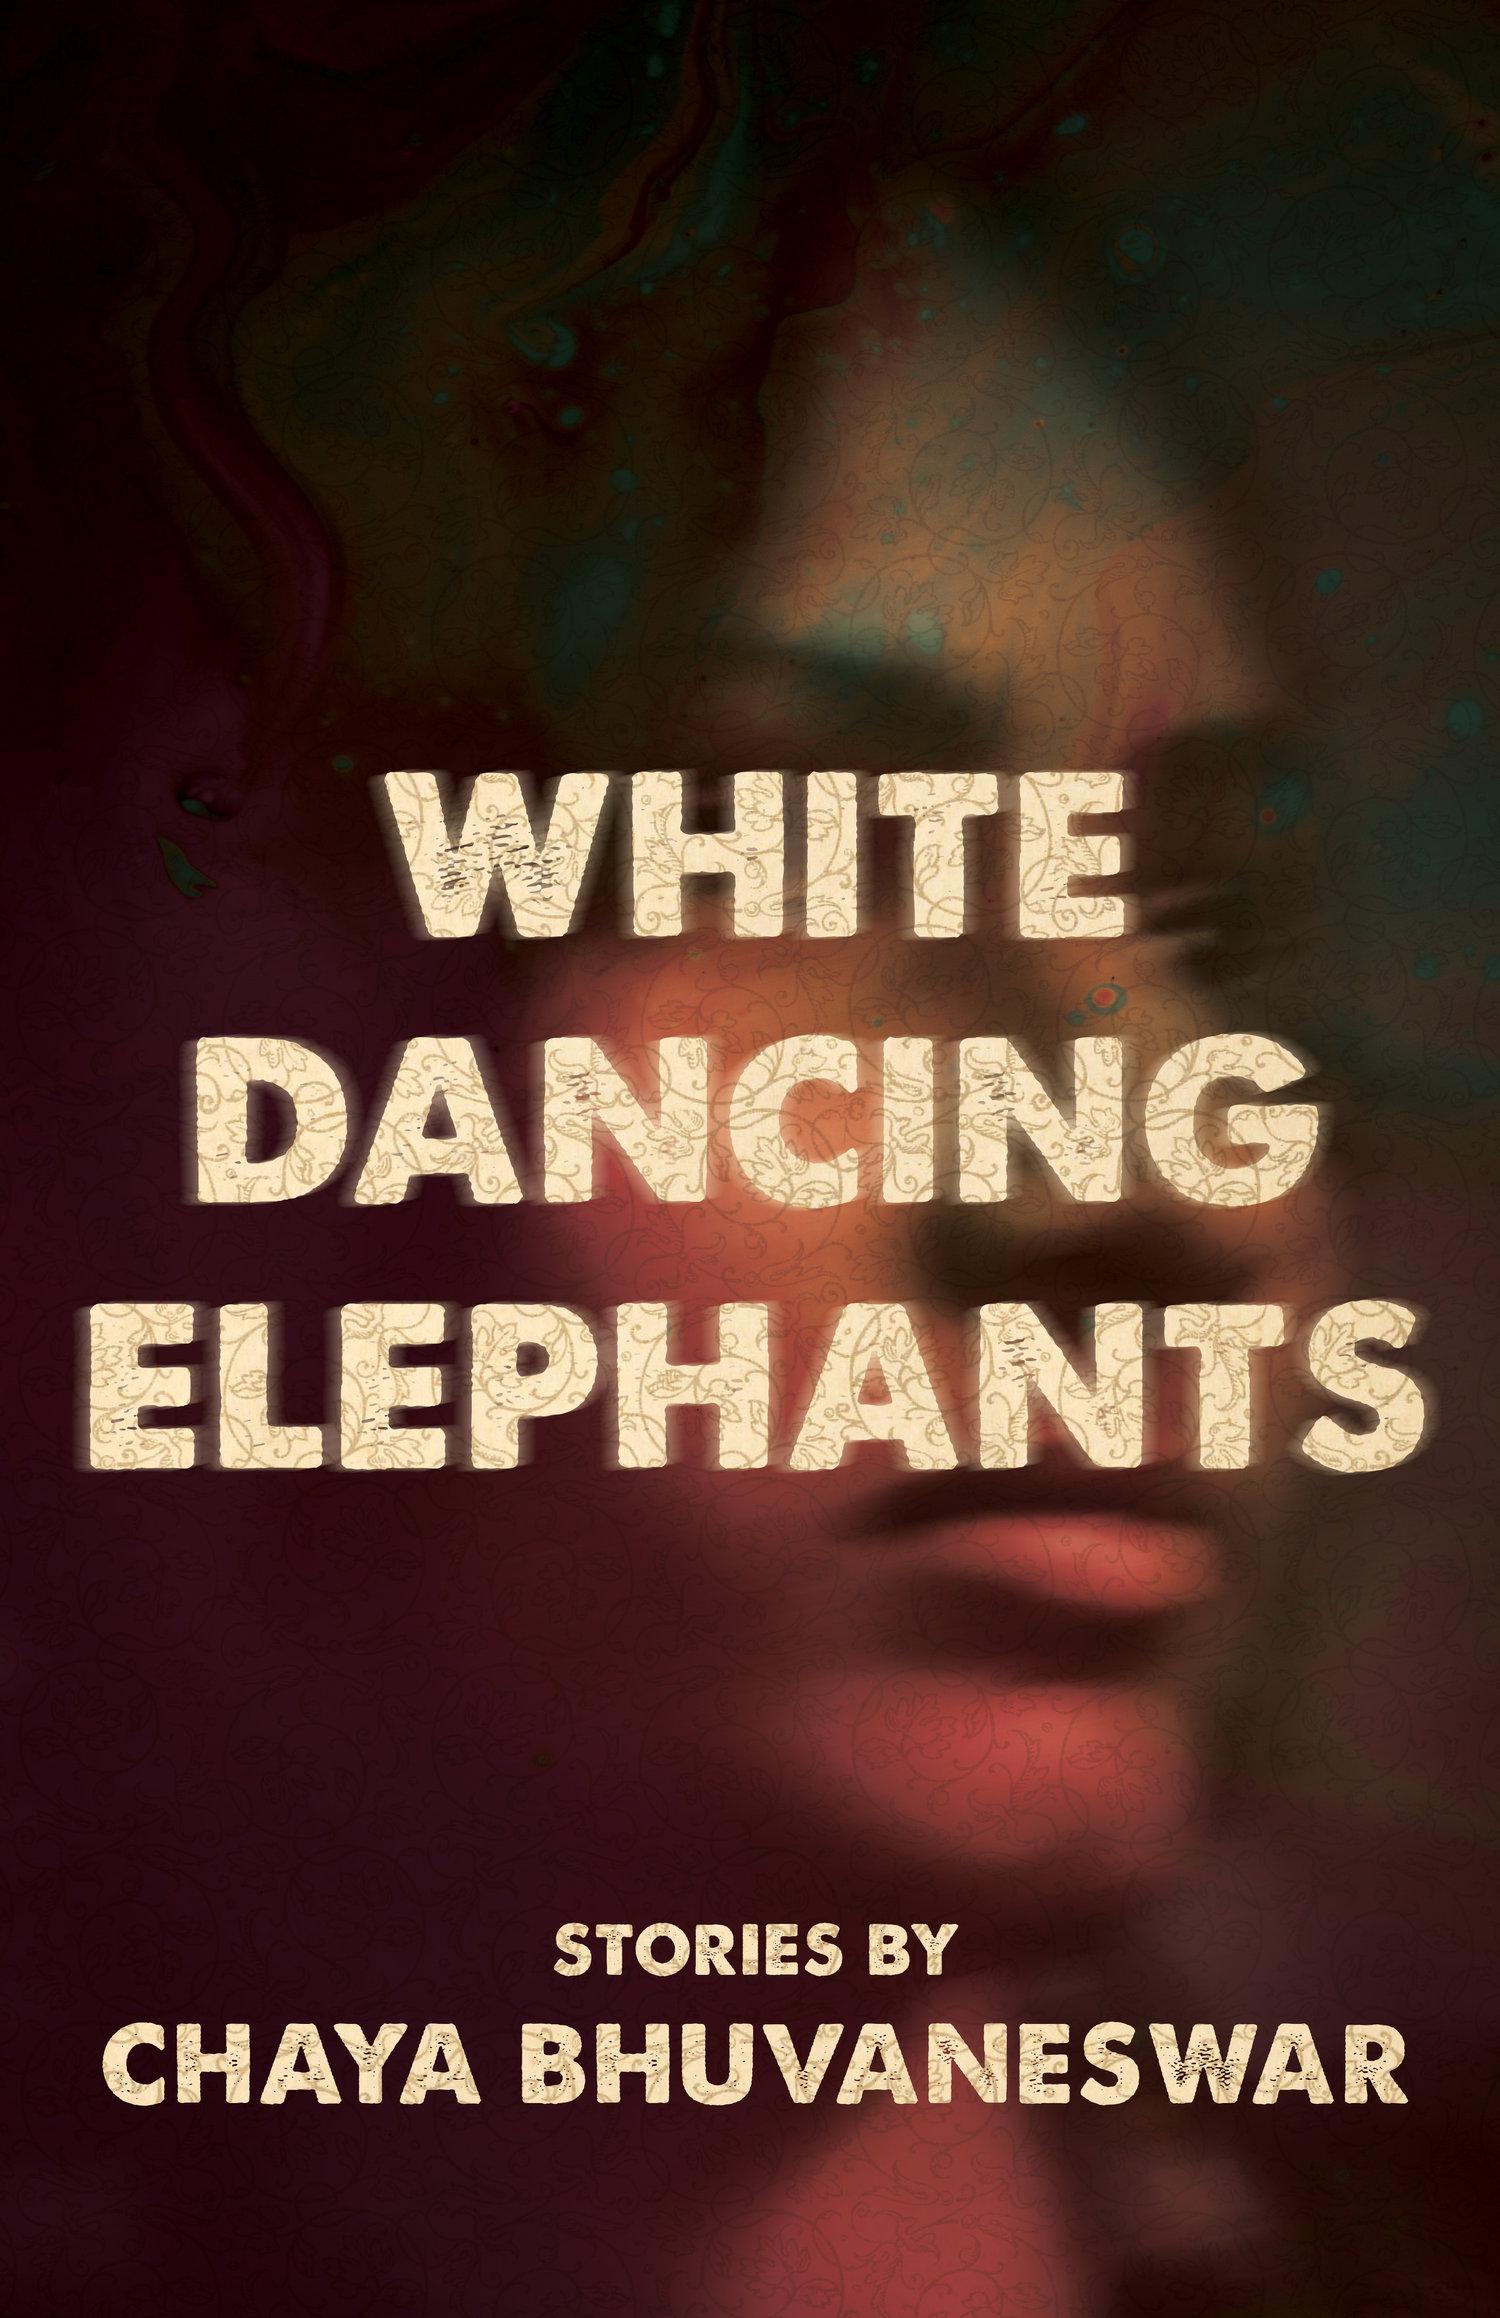 White dancing elephants by chaya bhuvaneswar dzanc books white dancing elephants by chaya bhuvaneswar fandeluxe Choice Image